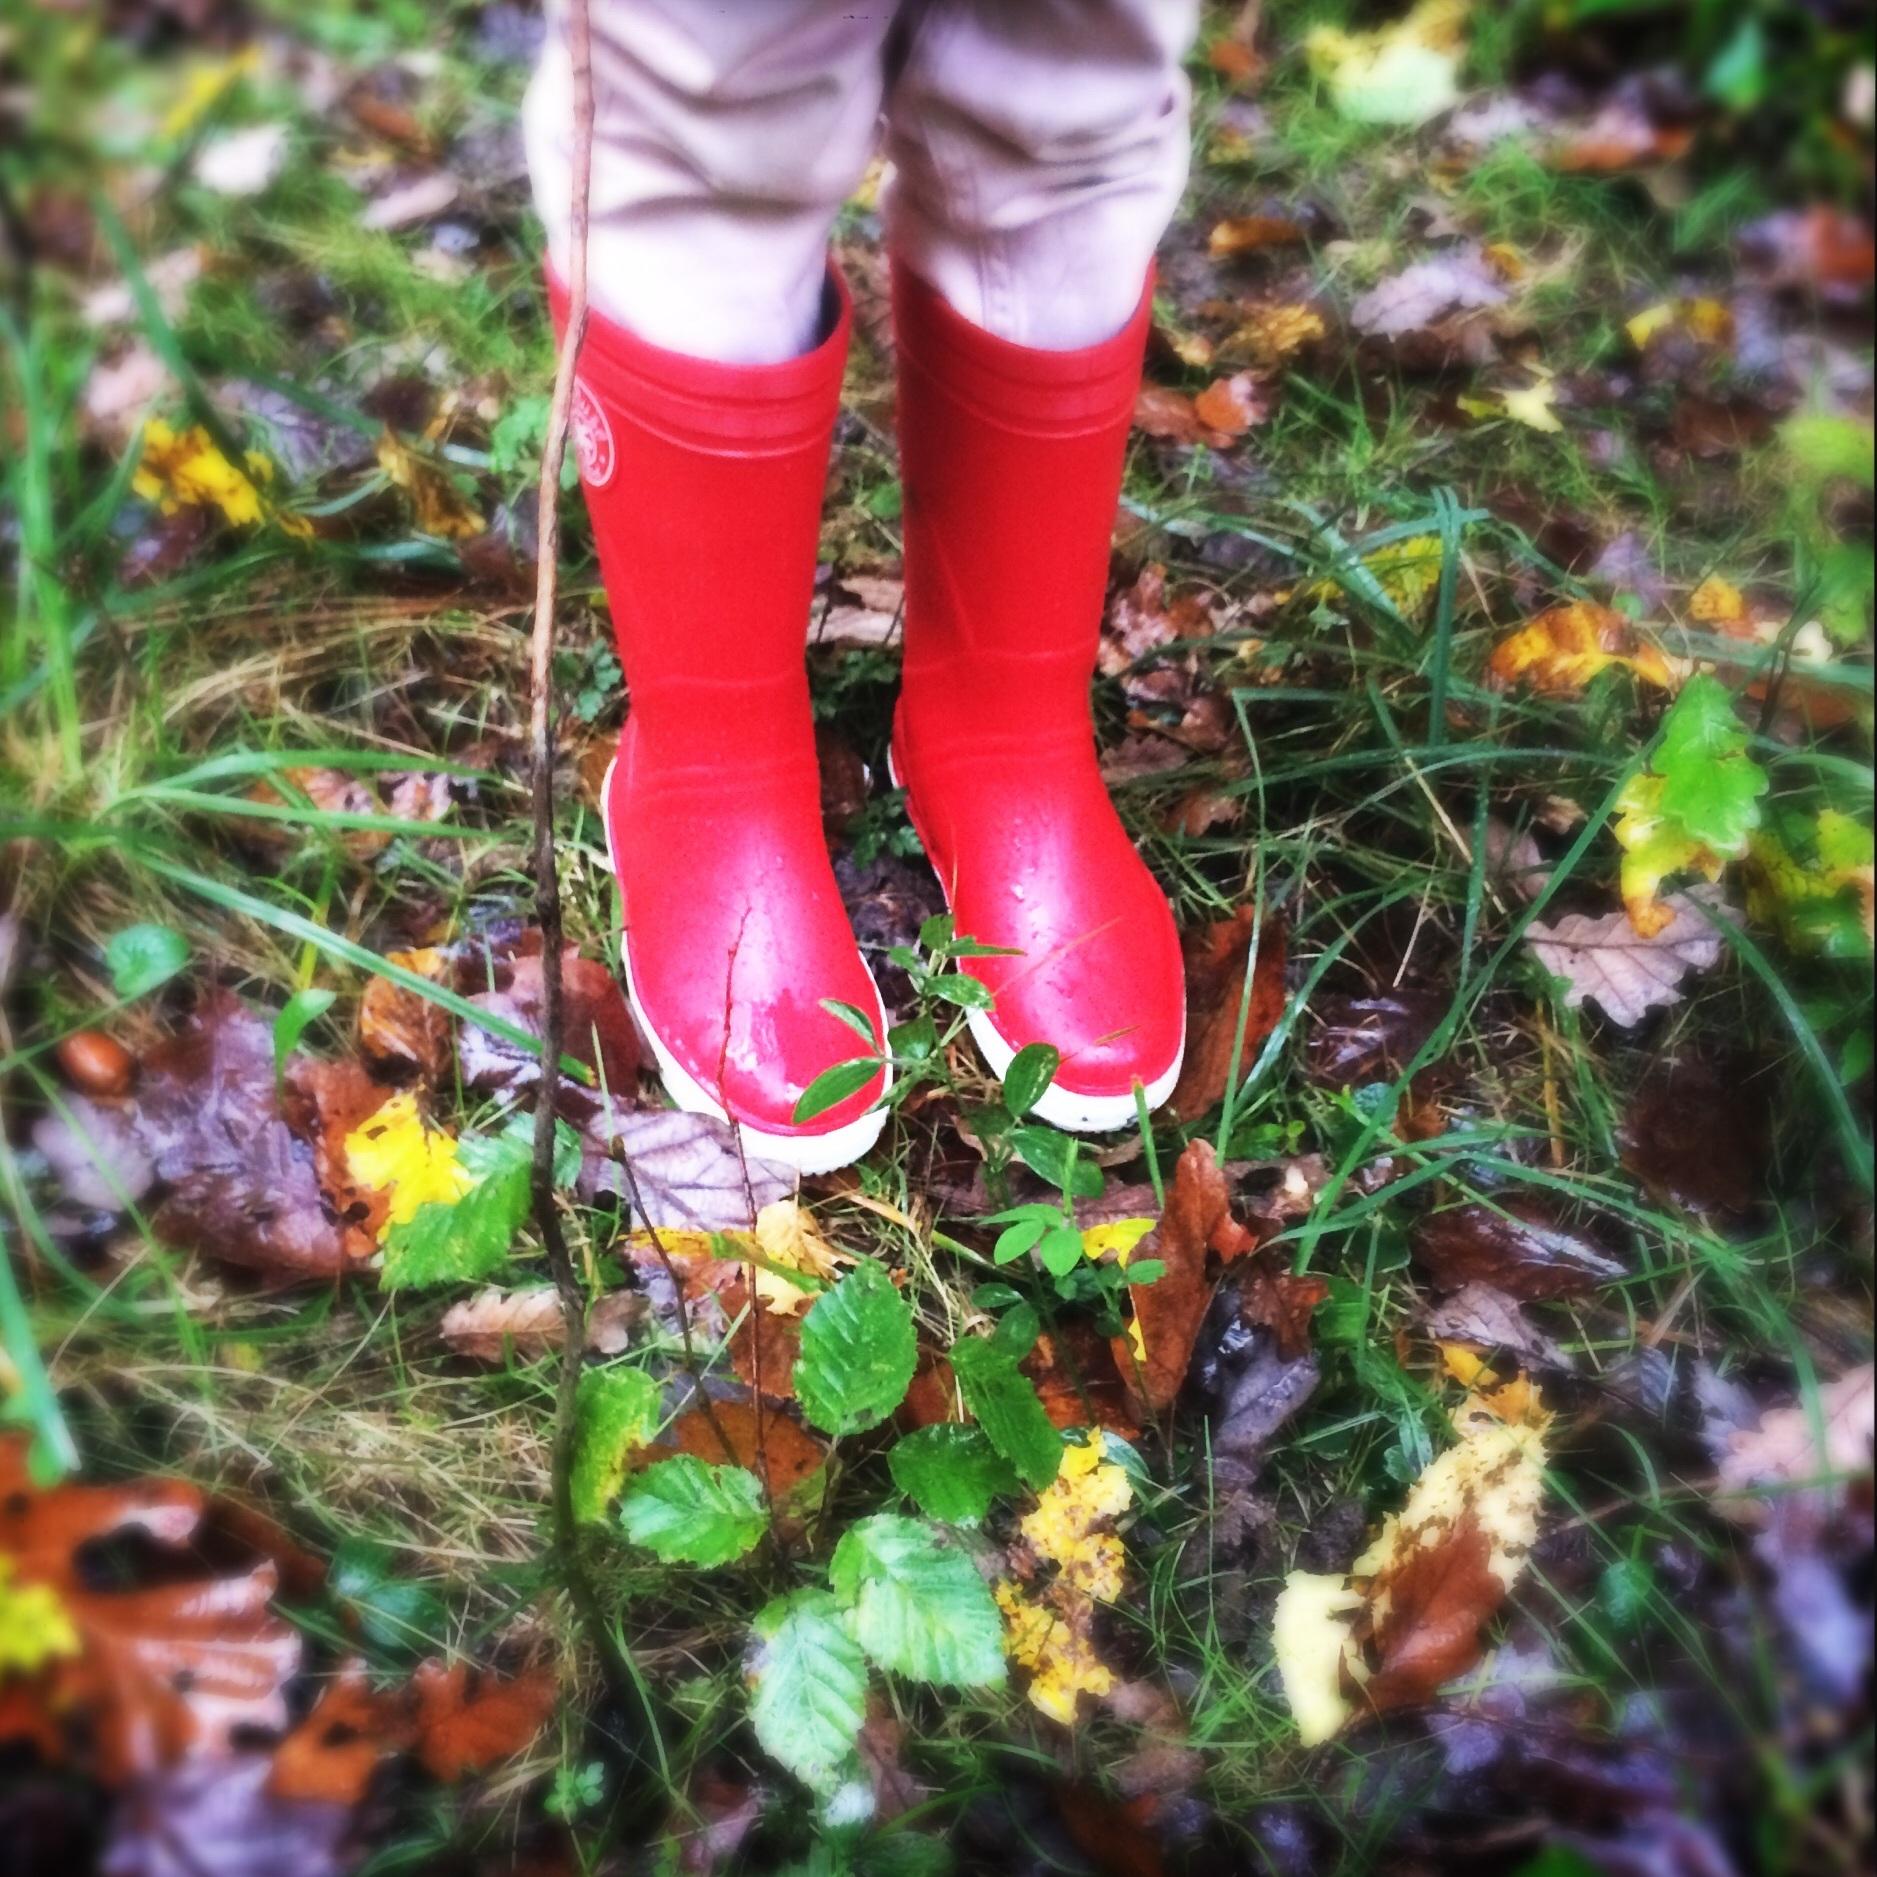 Herfstvakantie - Autumn Holiday, Les Vacances de Toussaint